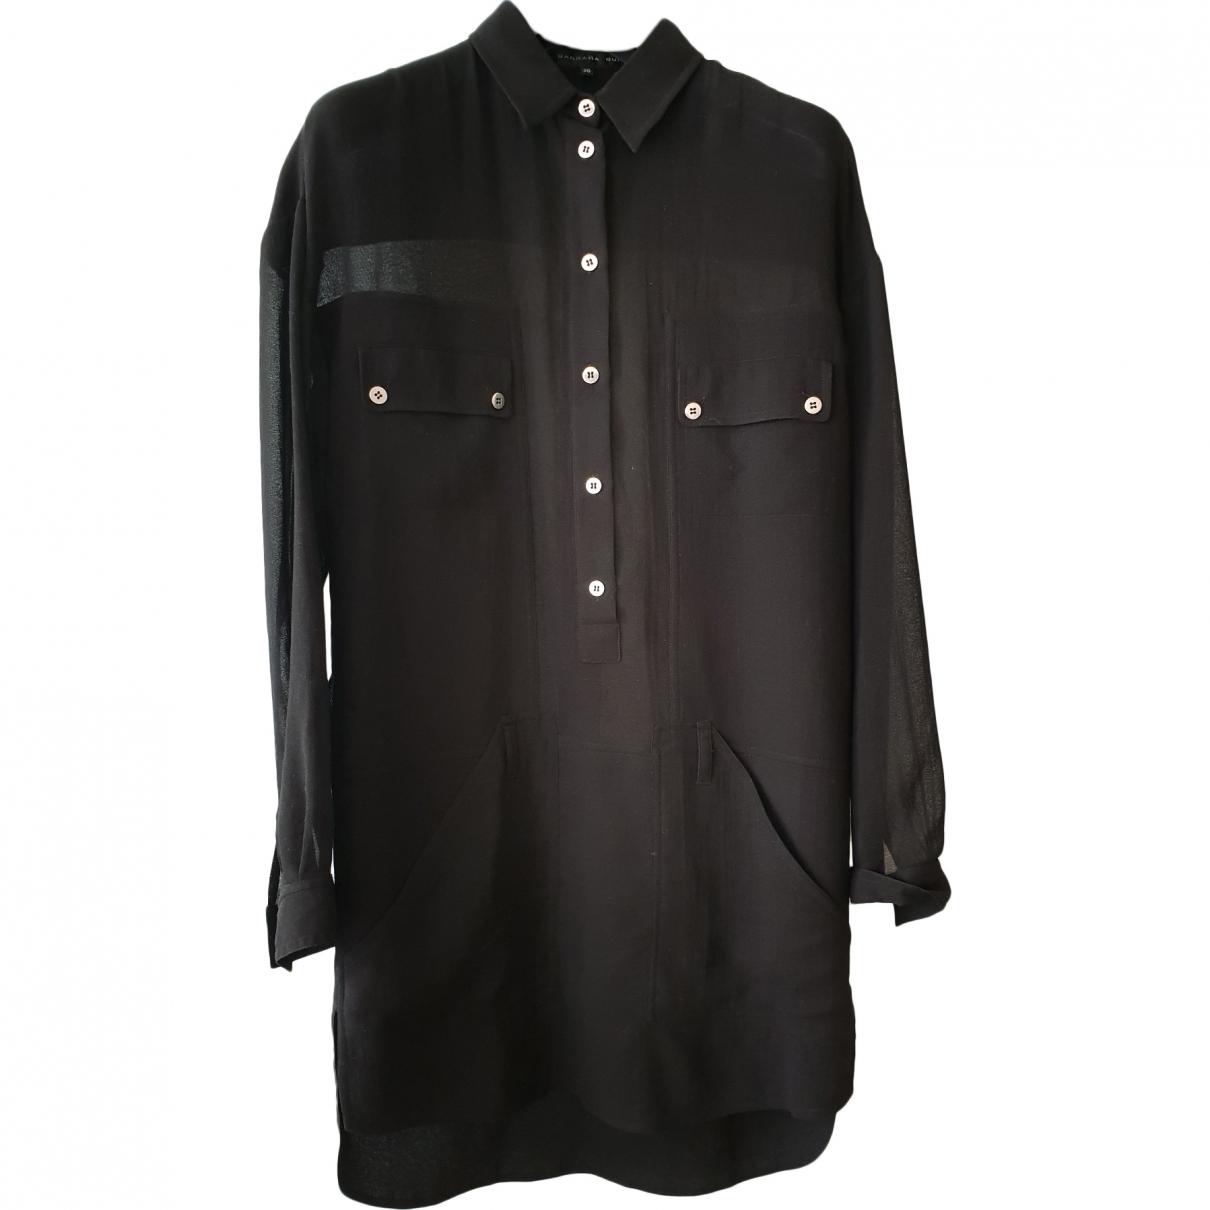 Barbara Bui \N Black Cotton dress for Women 36 FR